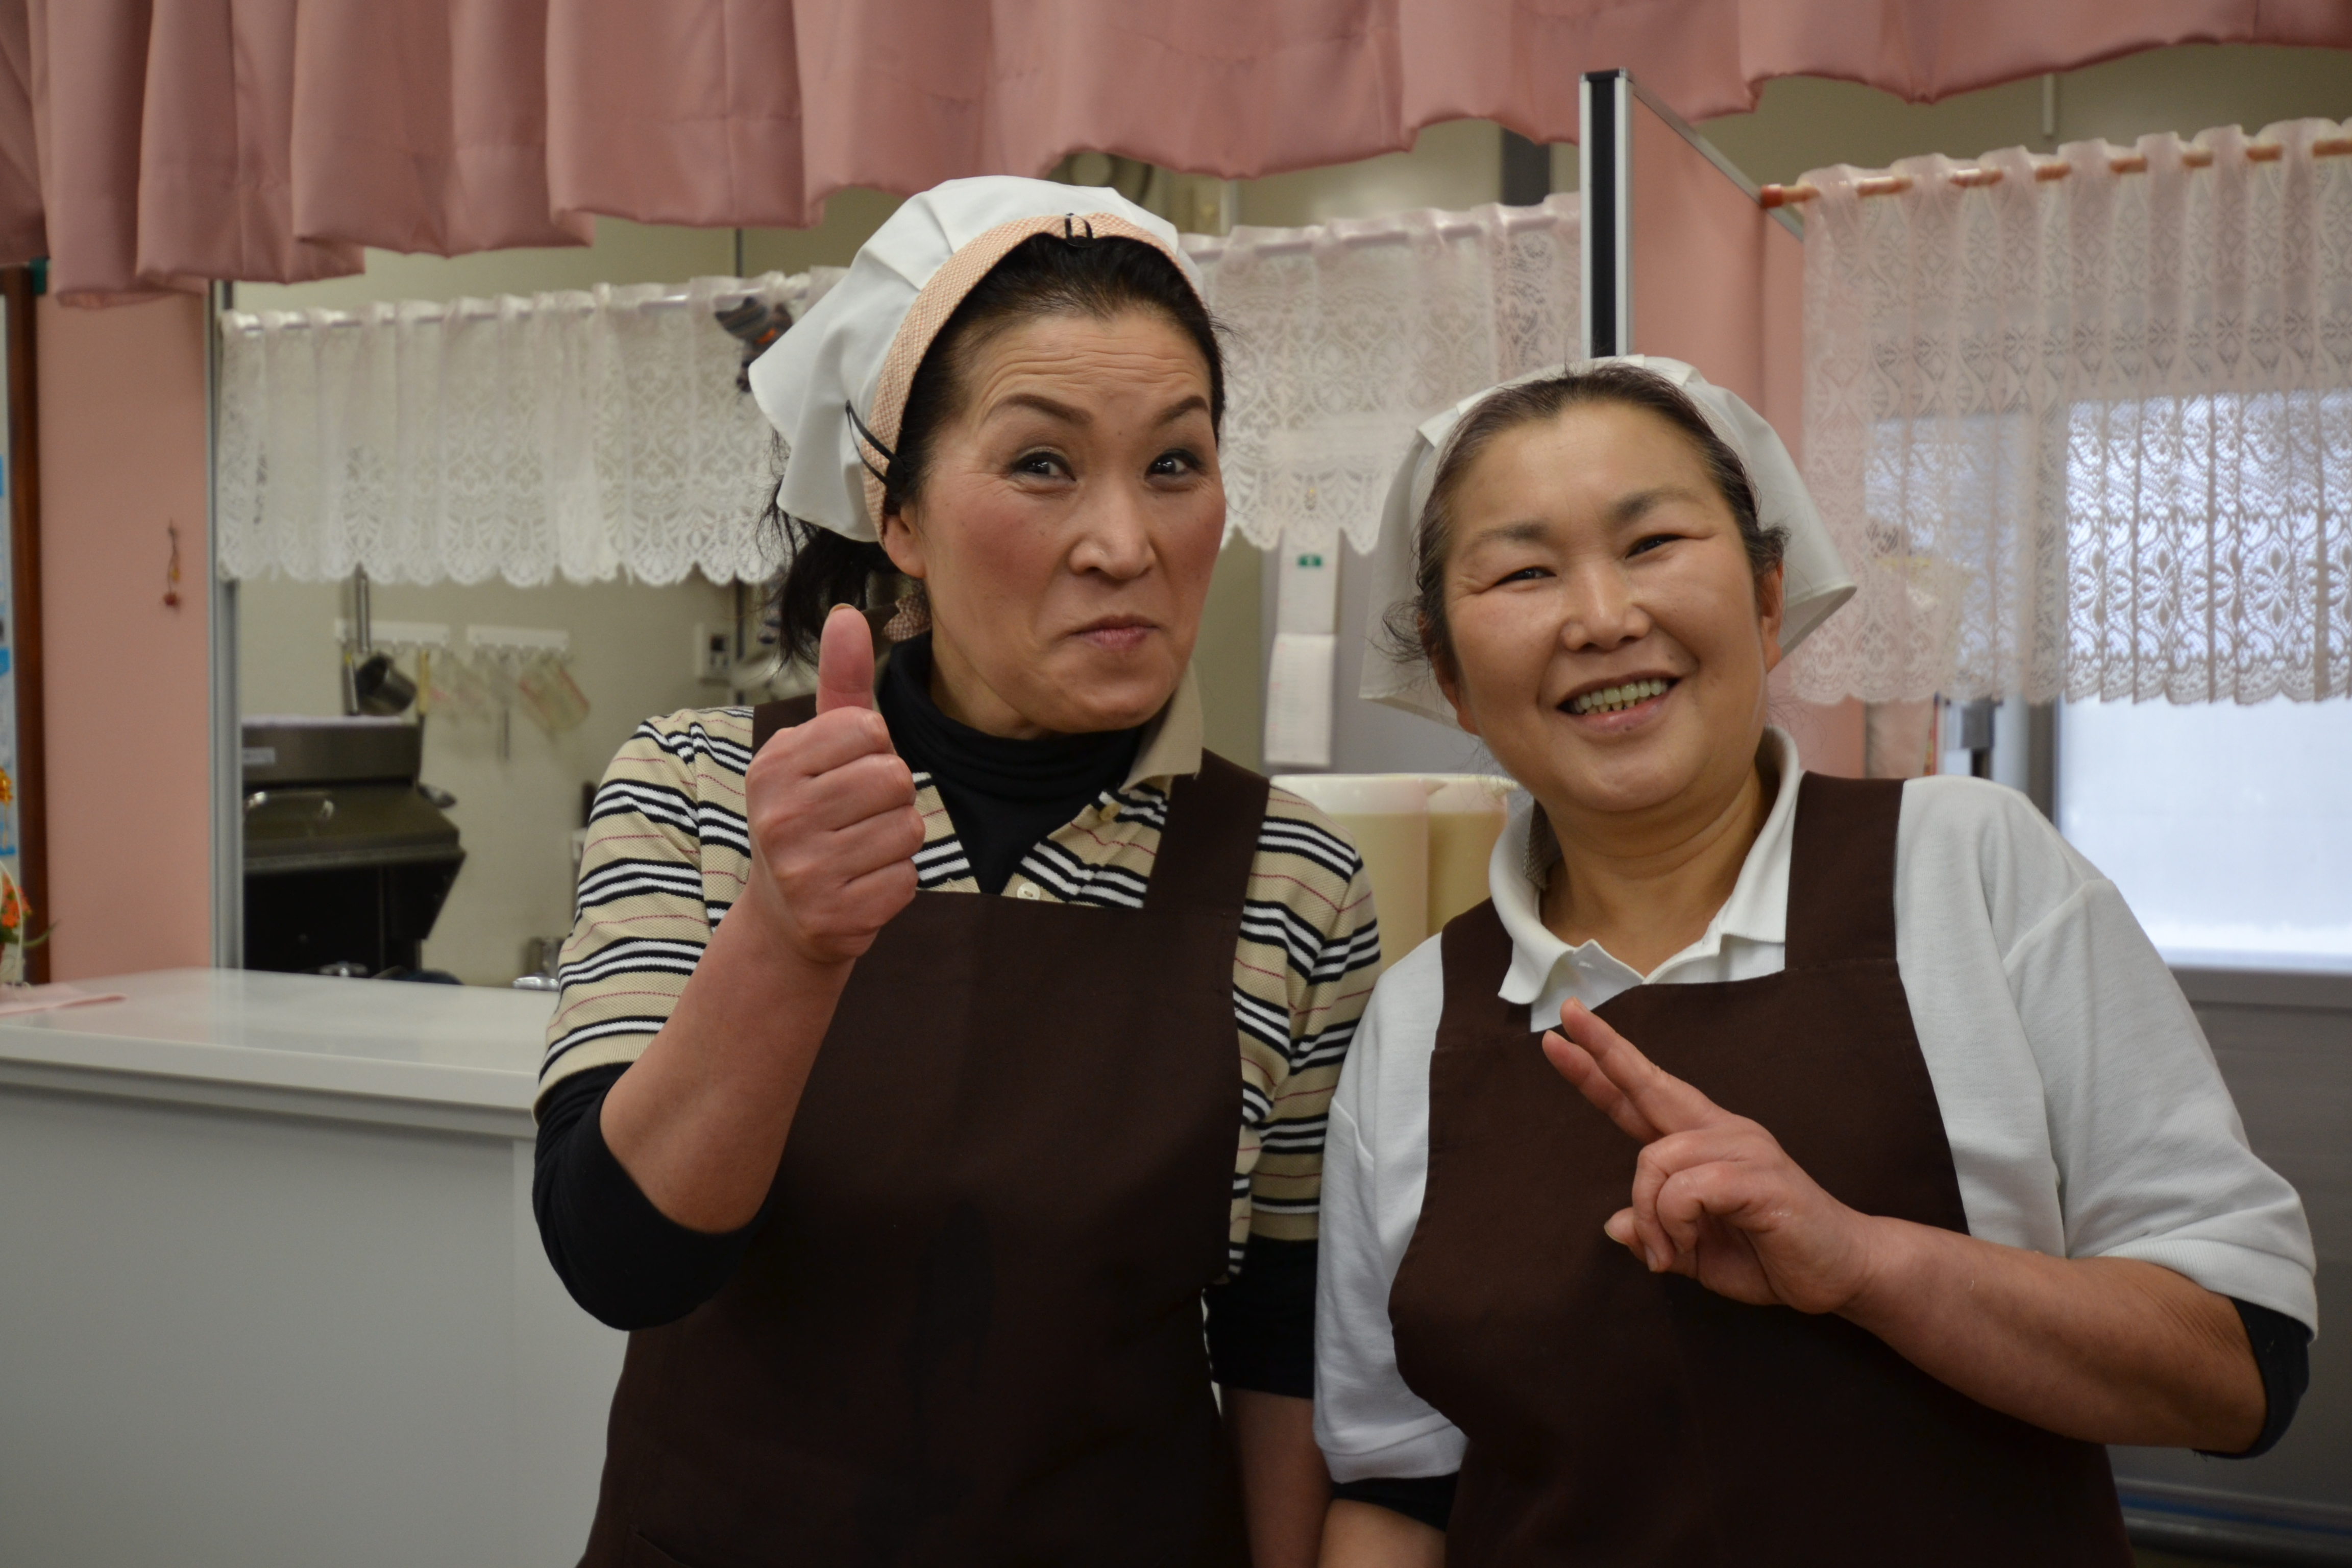 otsuchi temp shopping centre udon shop women.JPG